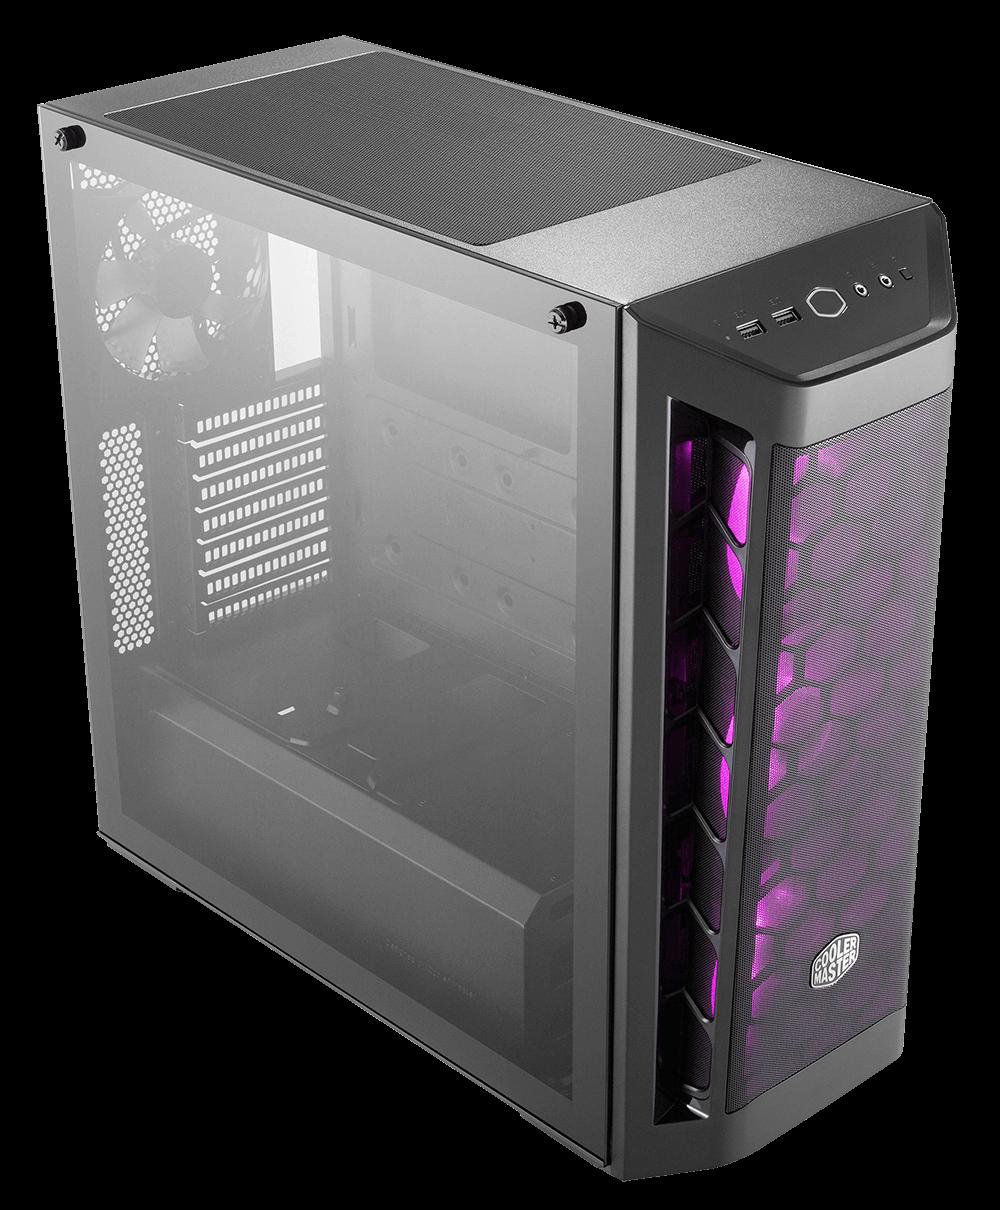 coolermaster-MCB-B511D-KGNN-RGB-01